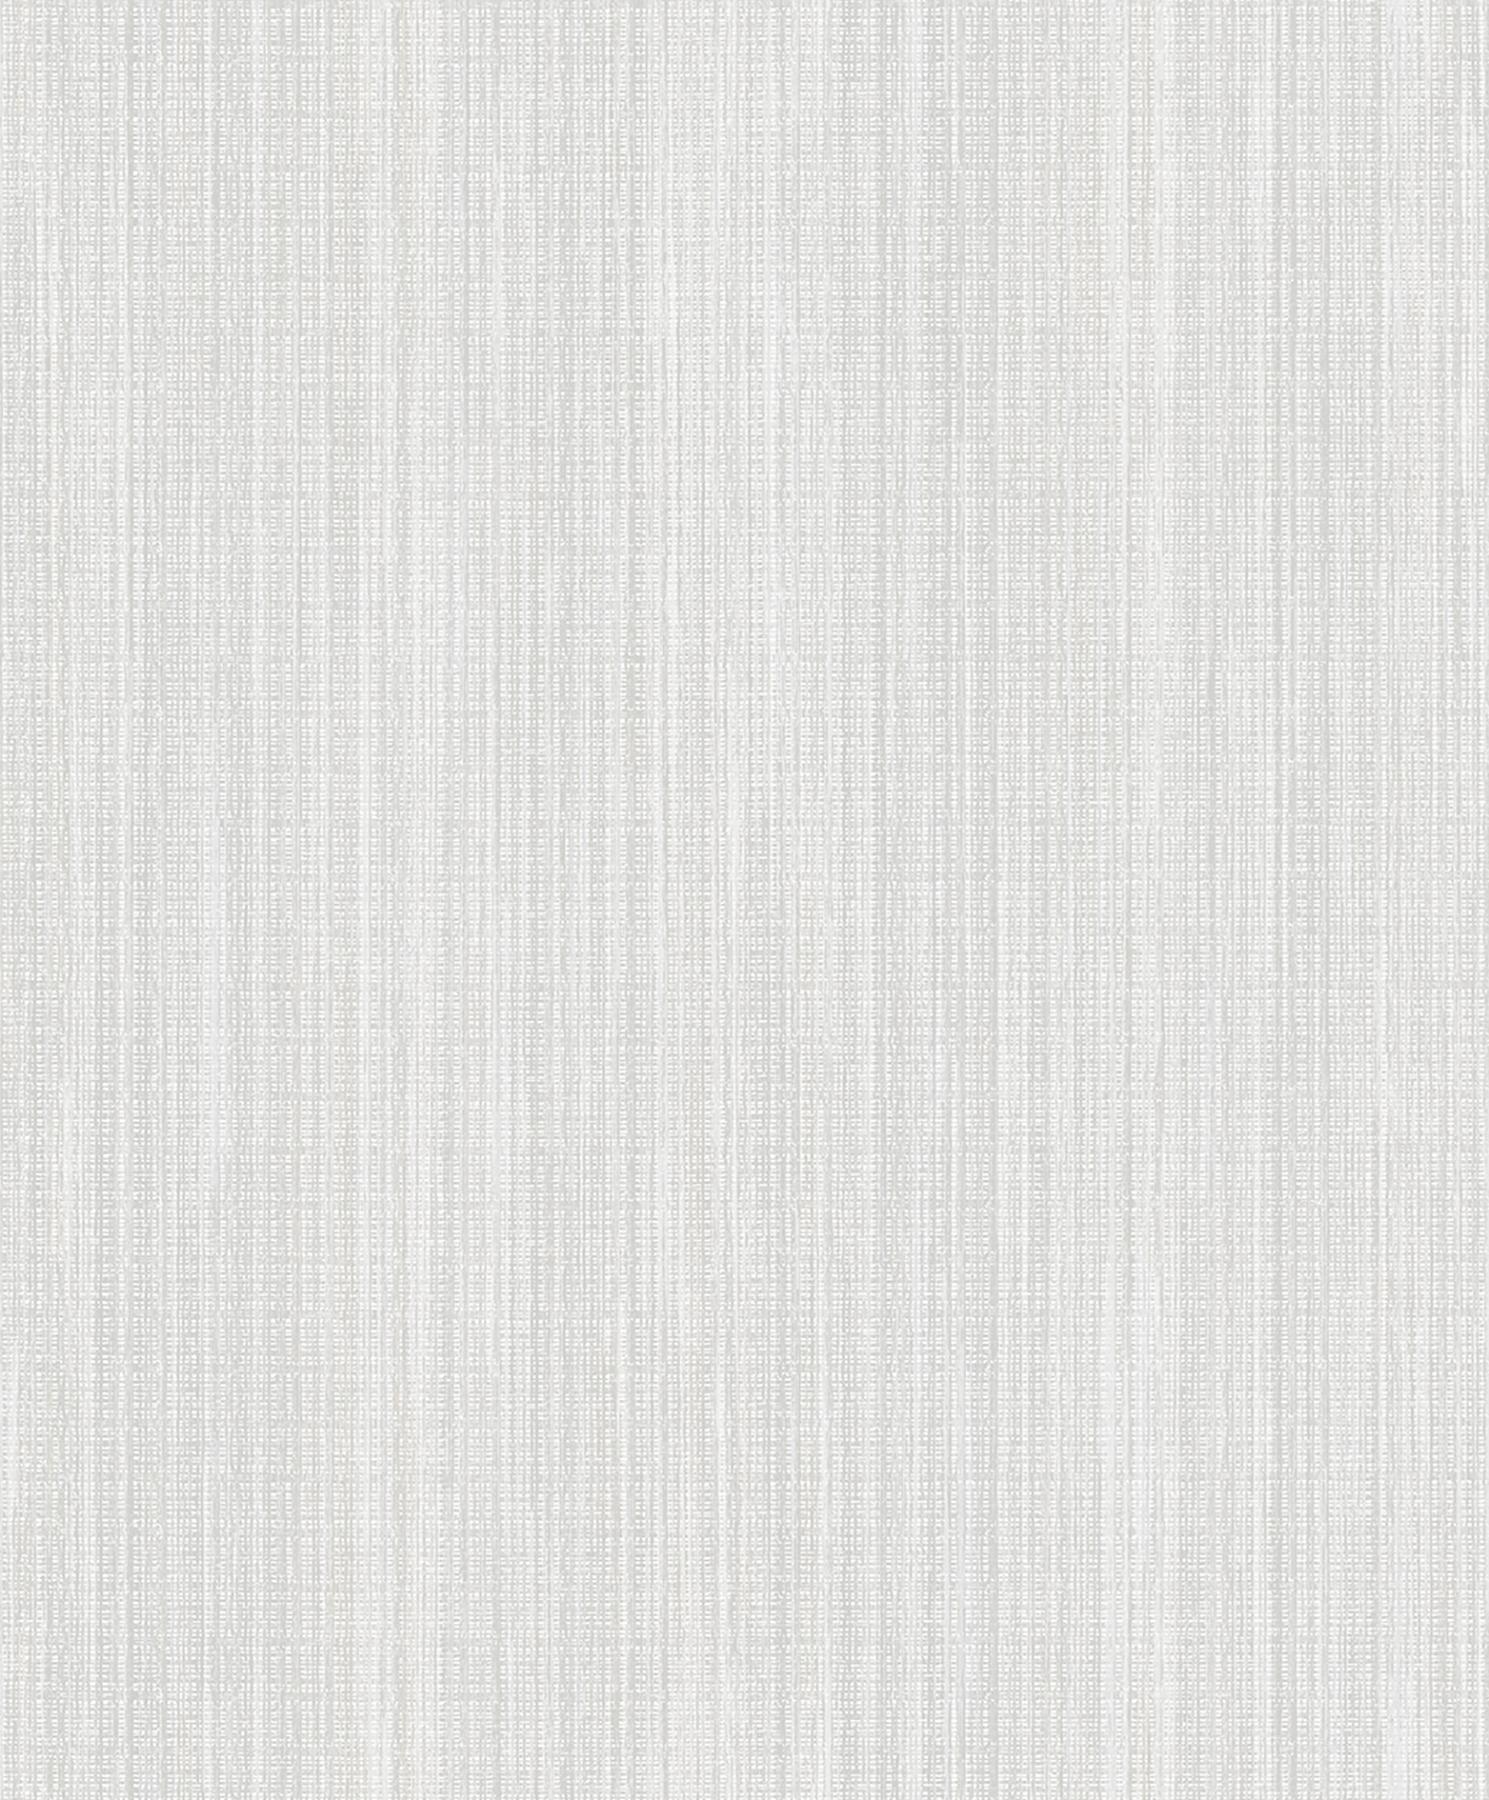 Picture of Audrey Bone Stripe Texture Wallpaper